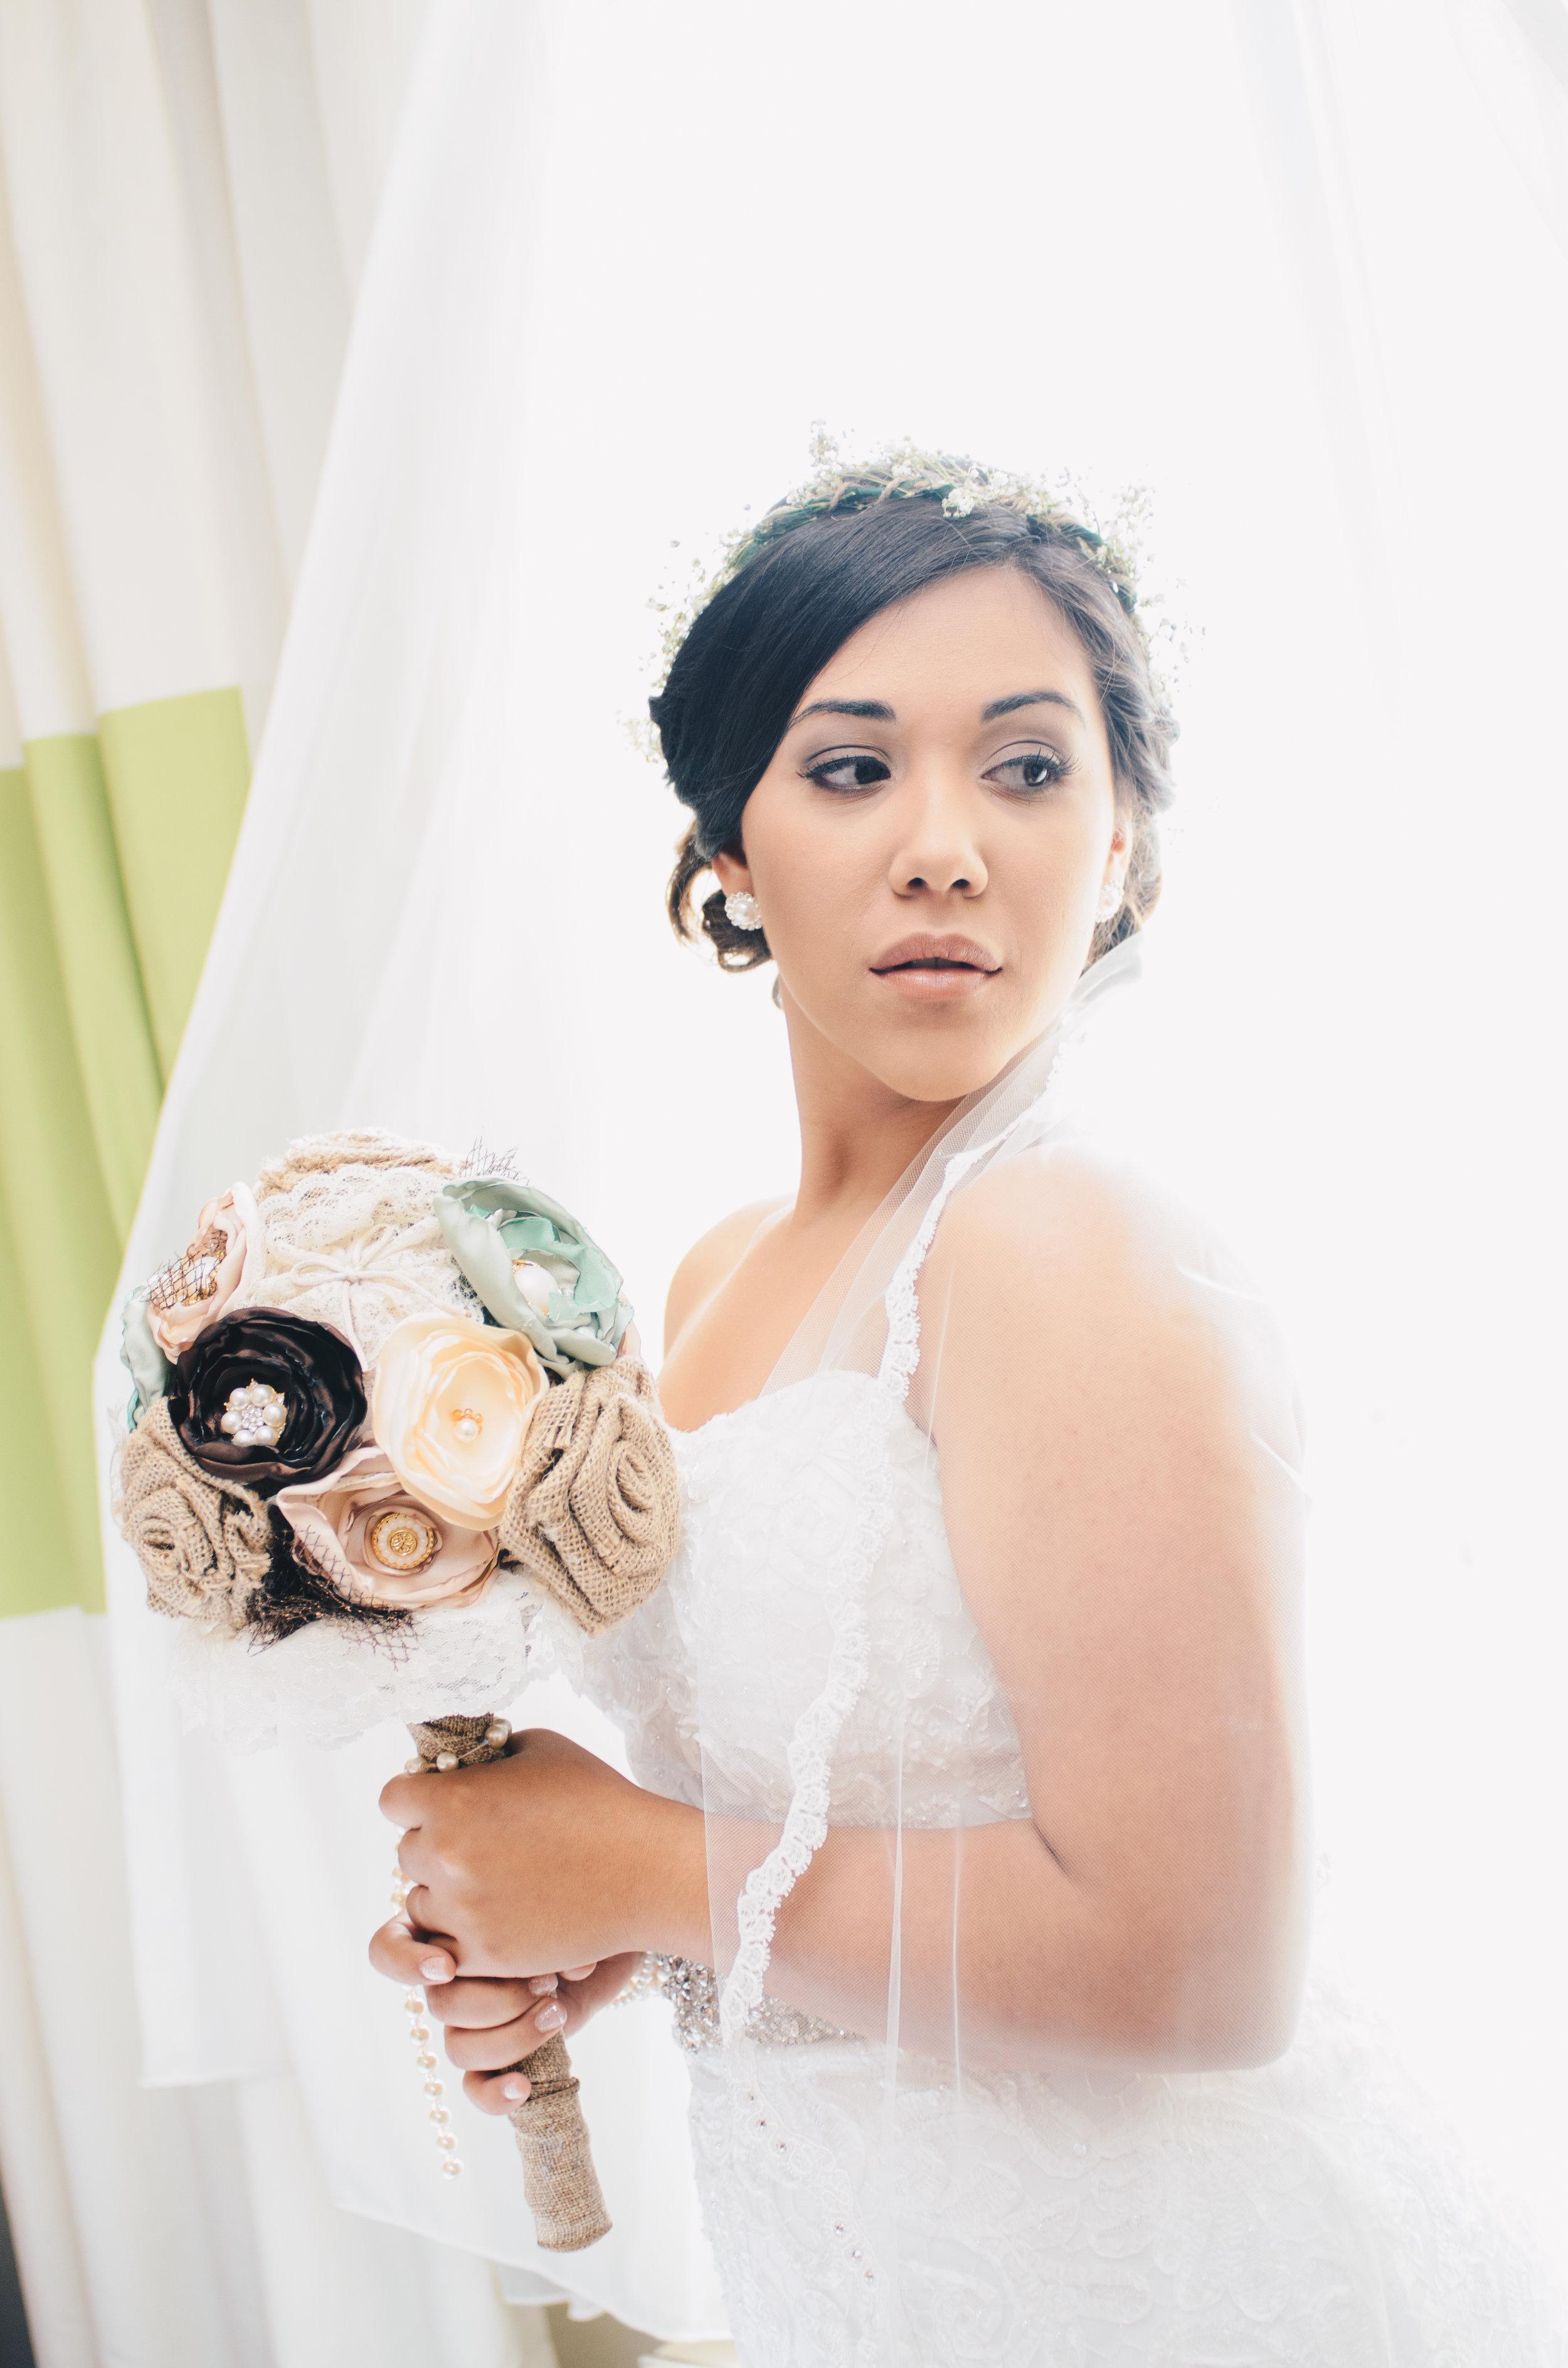 central-fl-christian-wedding-day-6.jpg